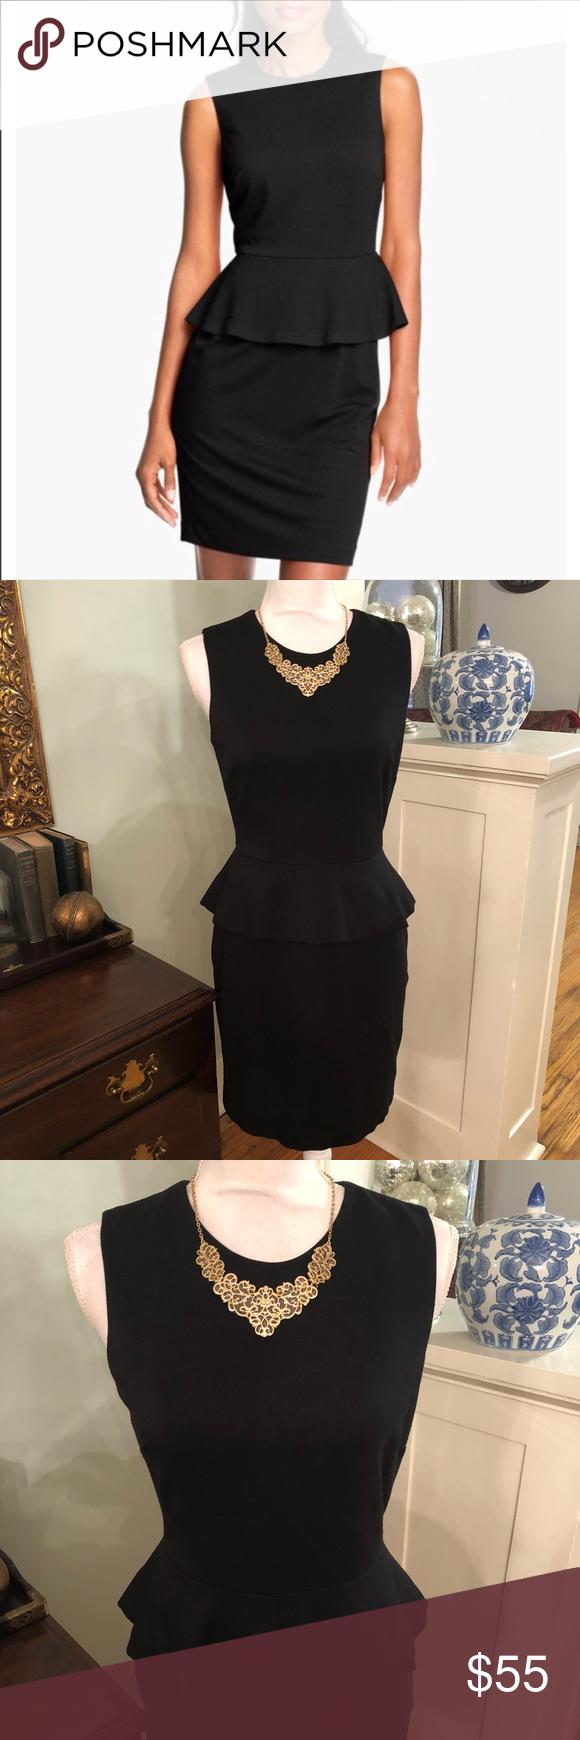 Vince Camuto Black Sheath Dress Sleeveless Peplum Black Sheath Dress Clothes Design Fashion [ 1740 x 580 Pixel ]